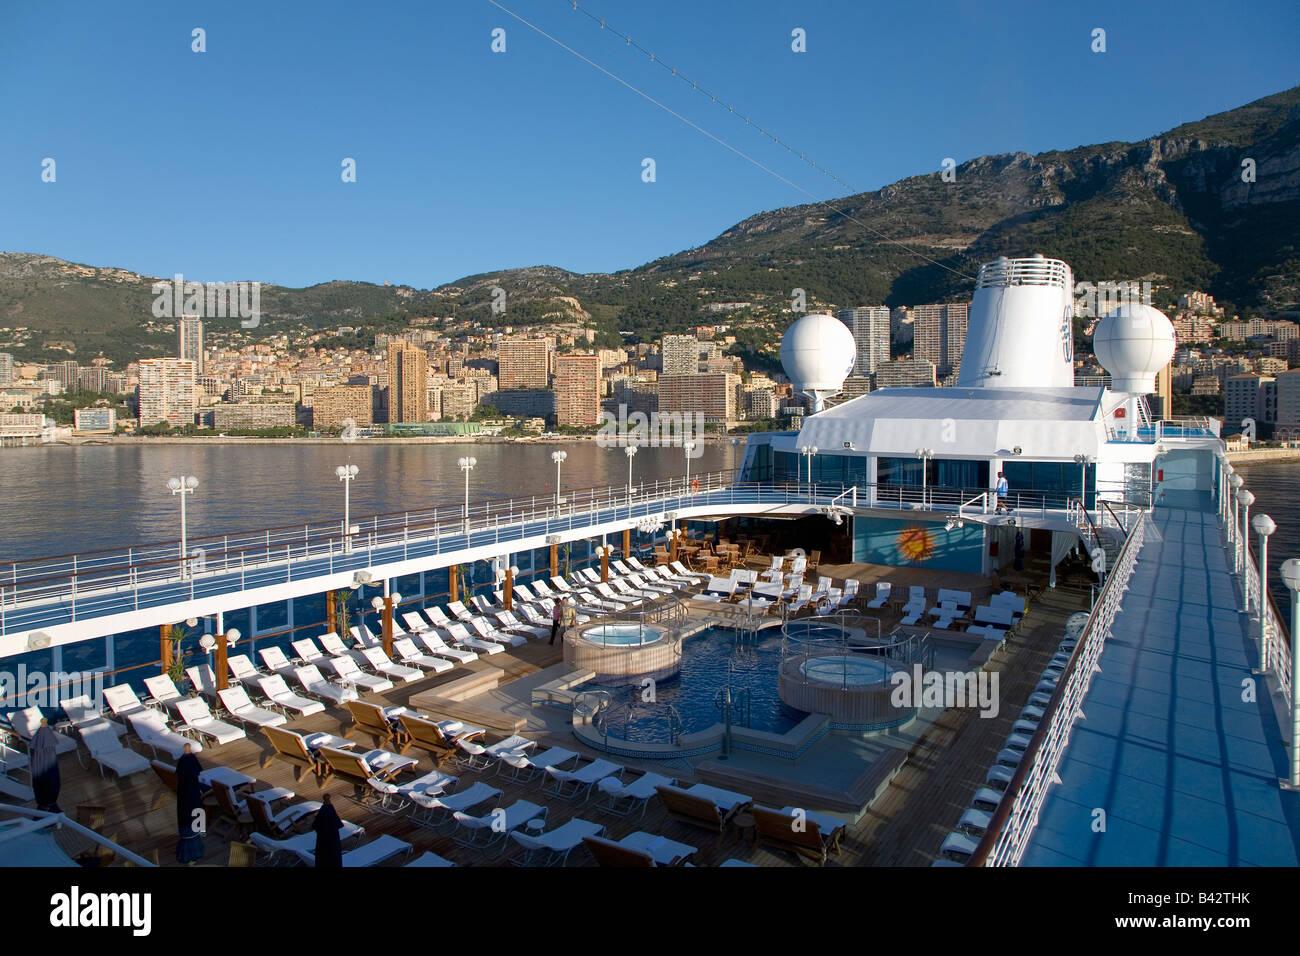 Upper Deck Swimming Pool Of Insignia Oceania Cruise Ship As It - Insignia cruise ship